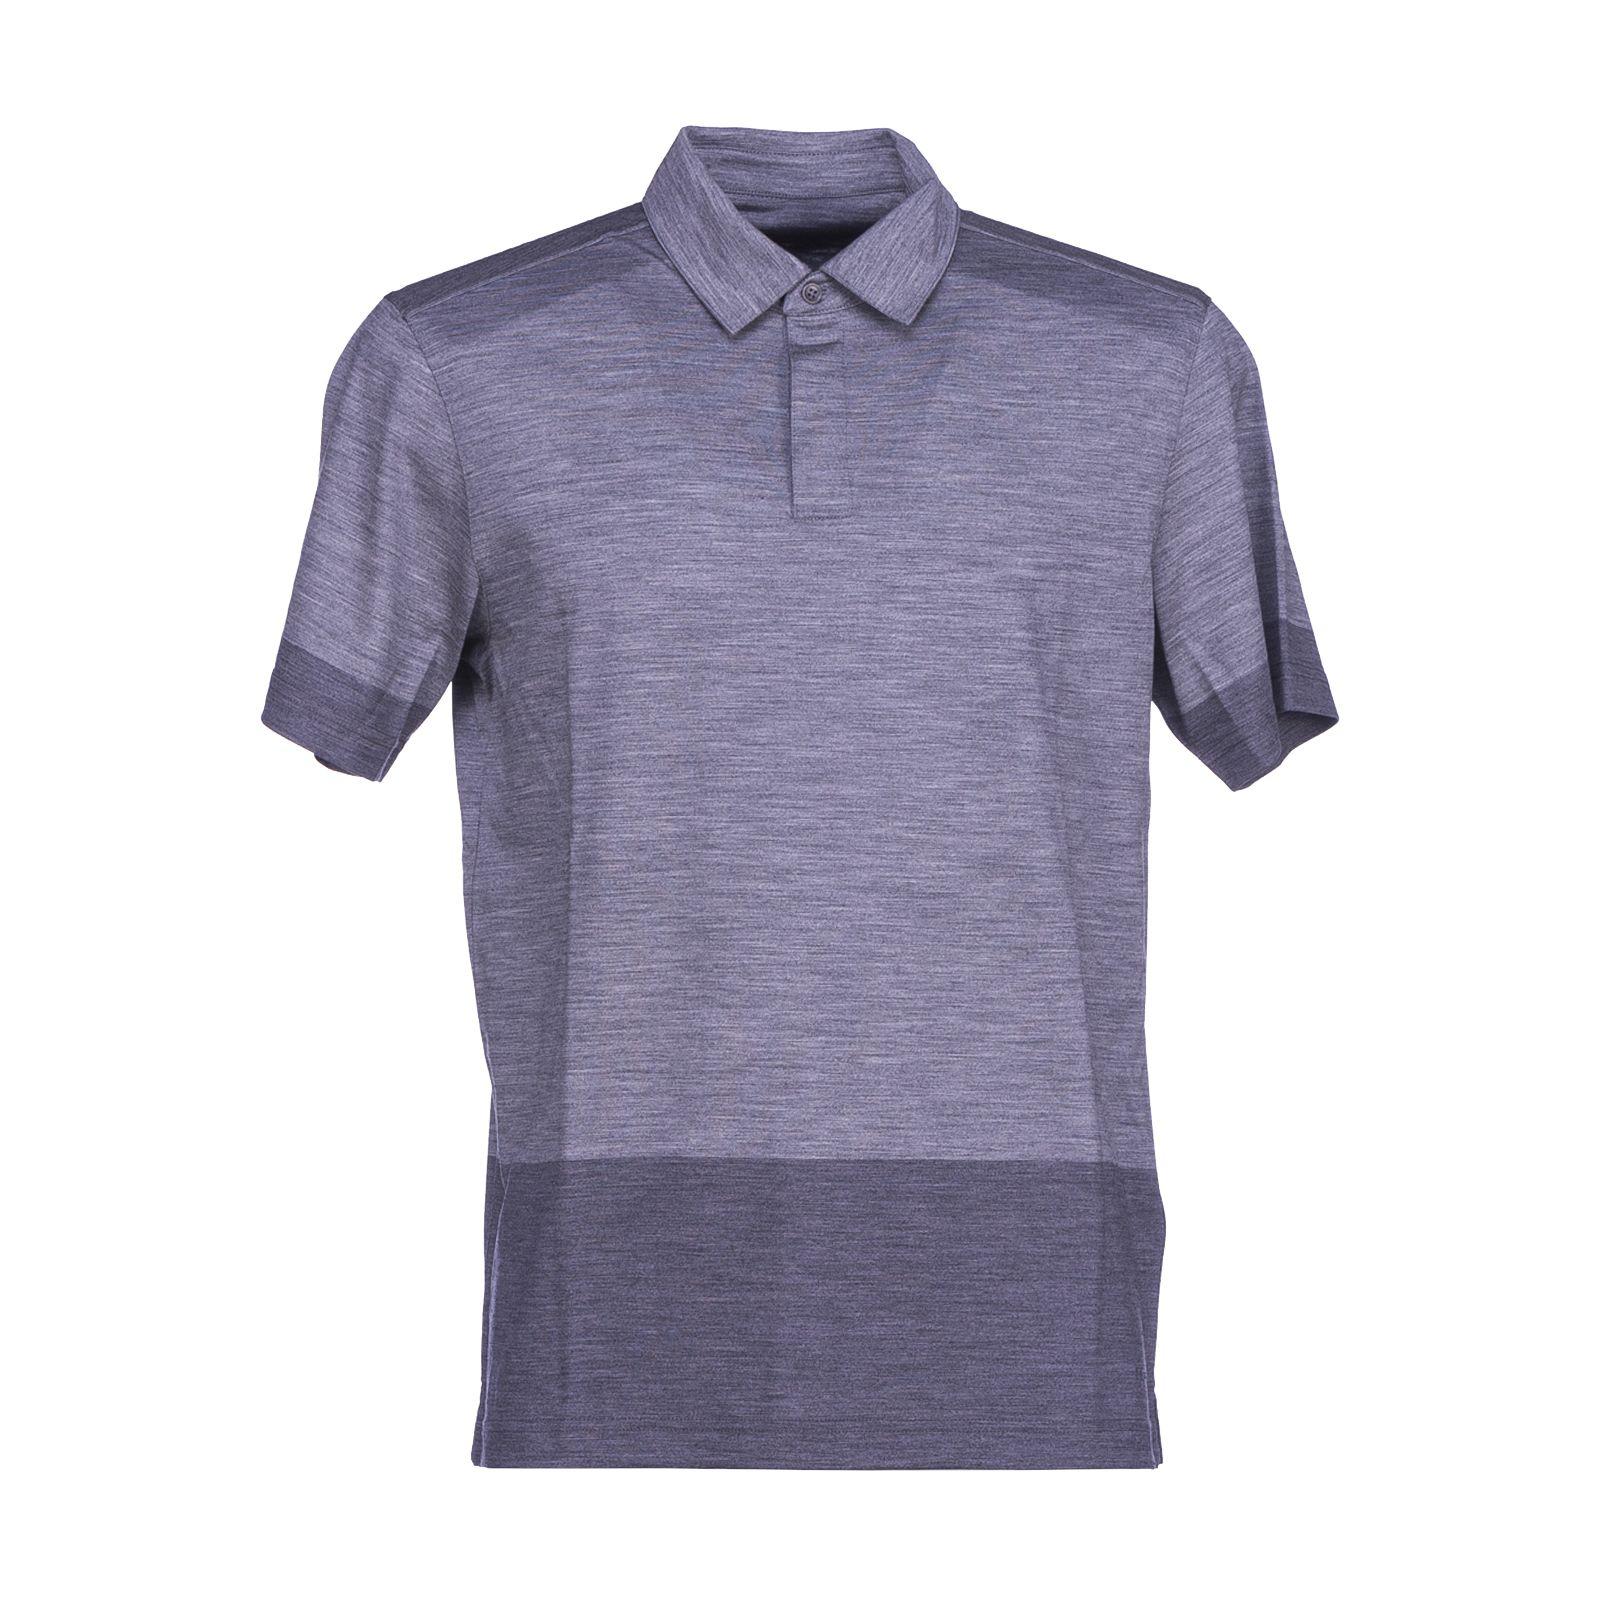 Z-zegna Classic Polo Shirt